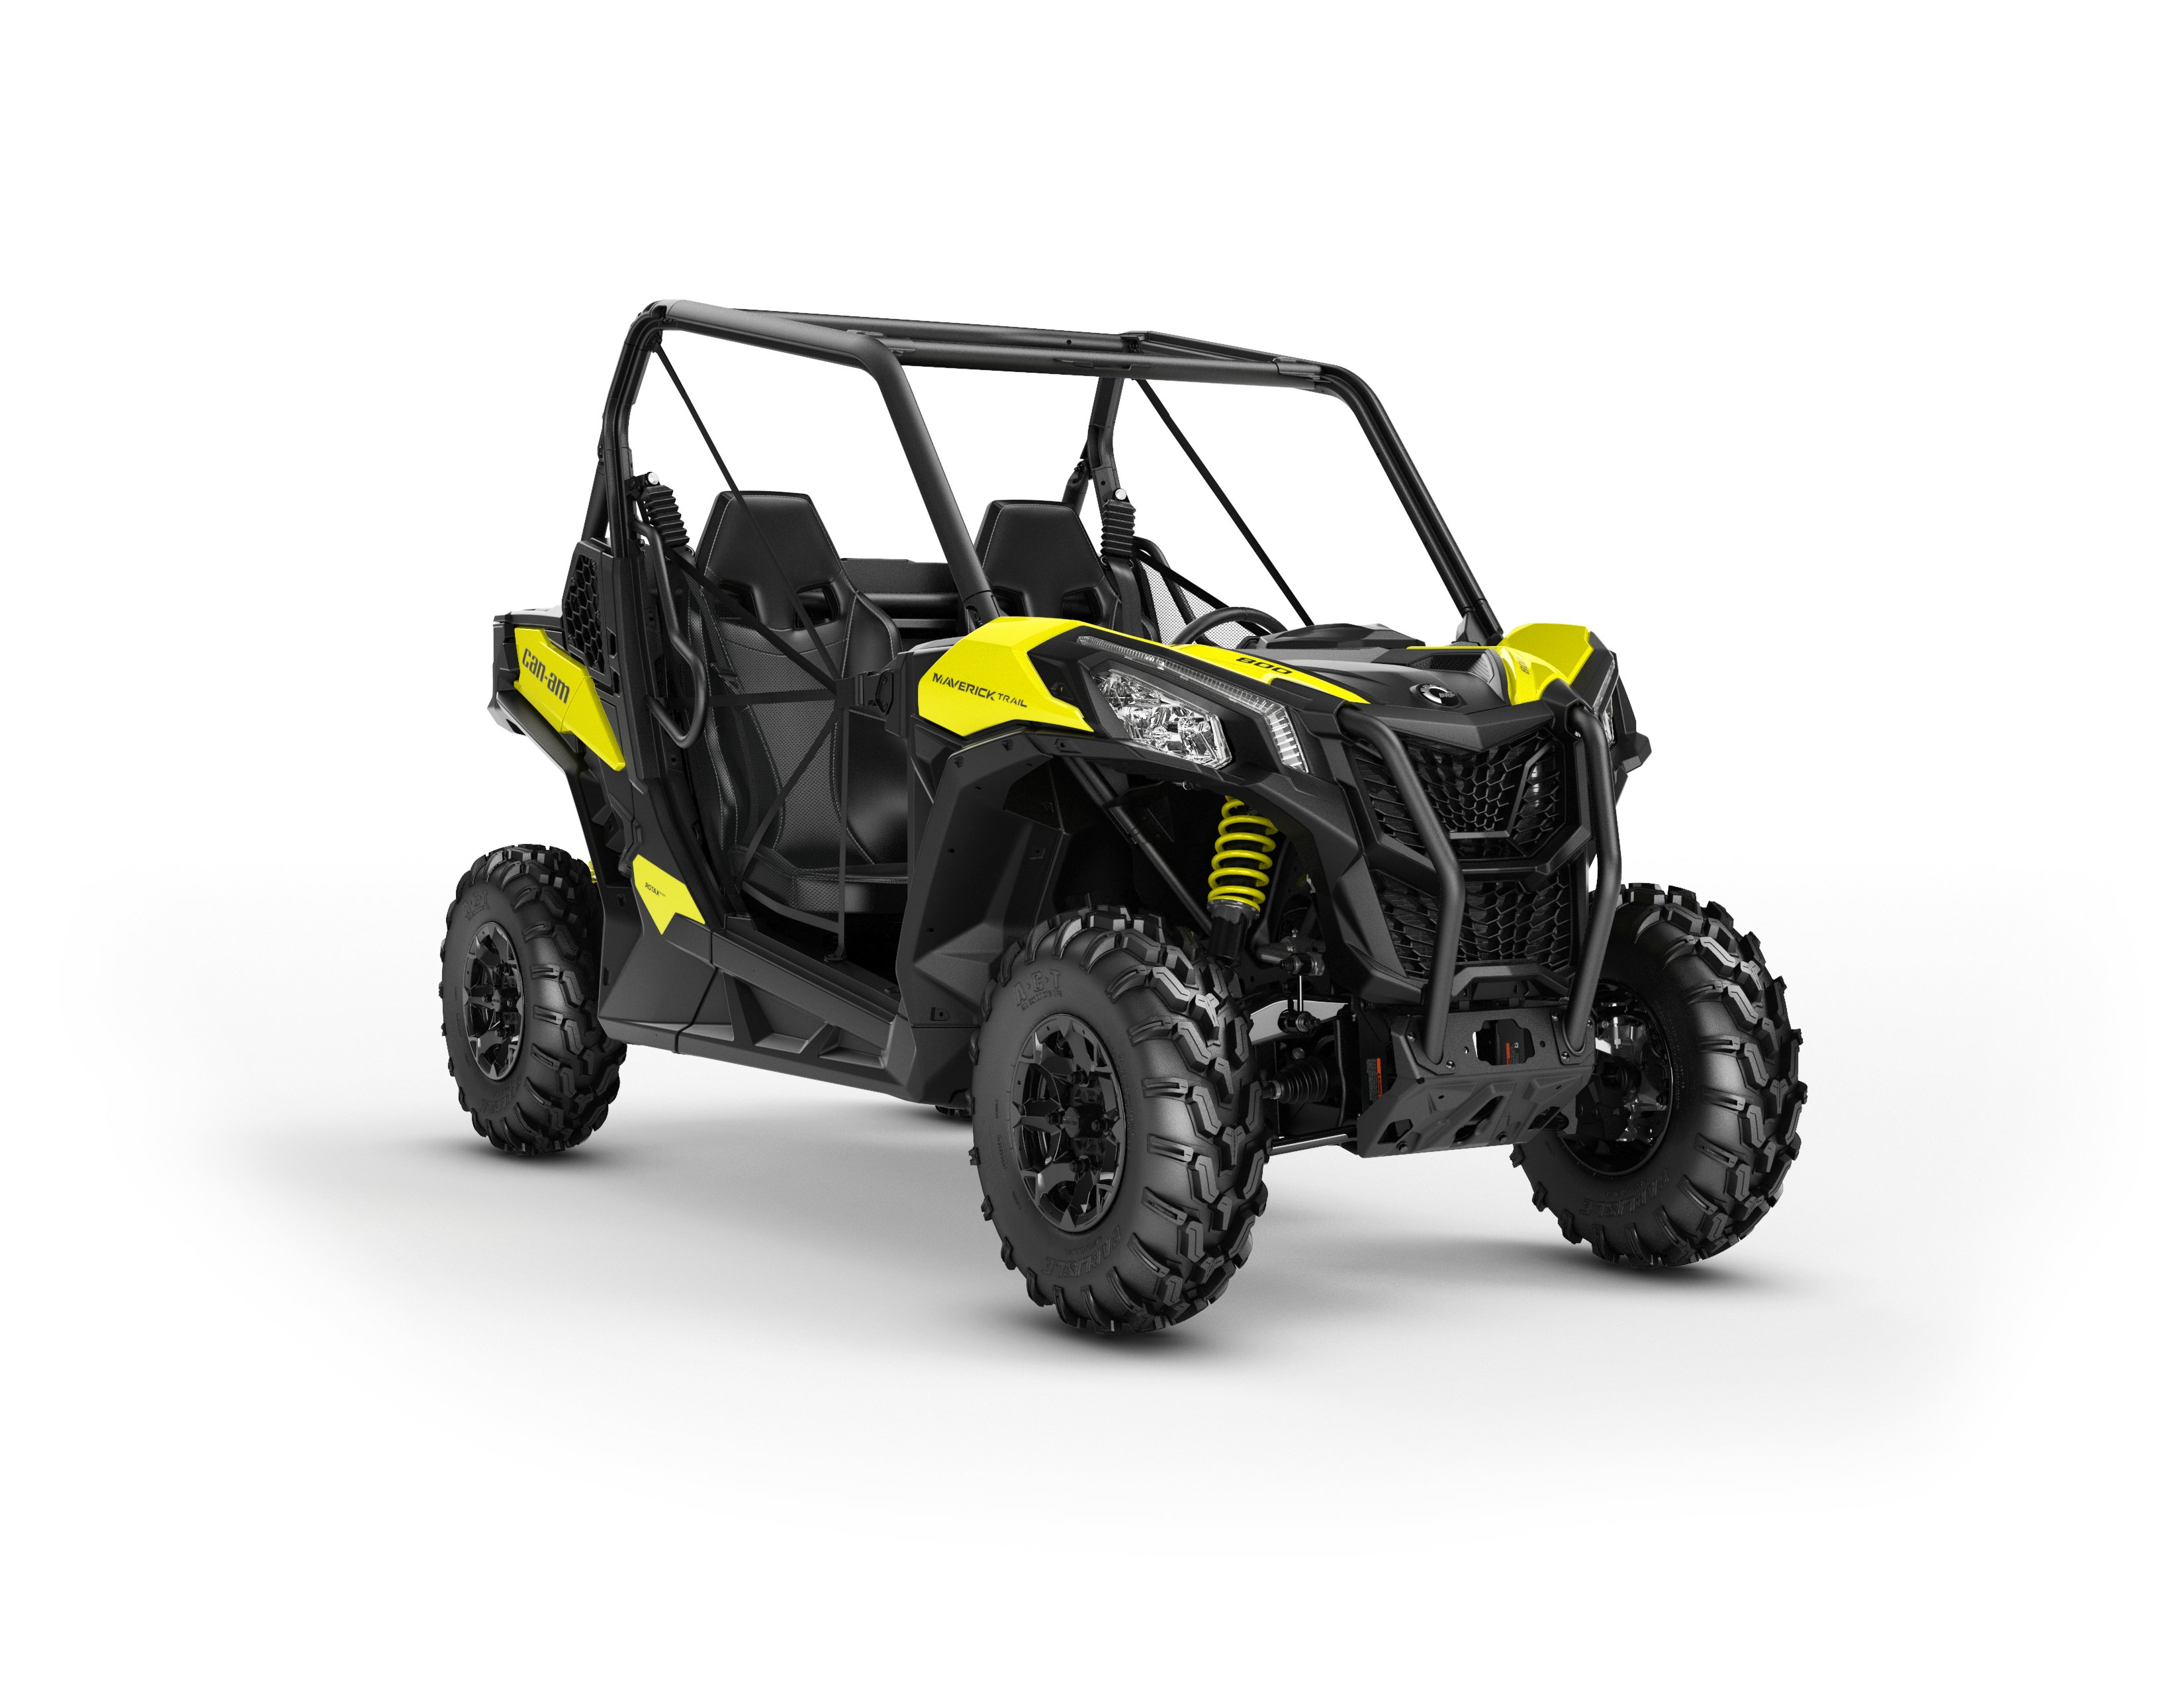 2018 Maverick Trail DPS 800 Sunburst Yellow_3-4 front